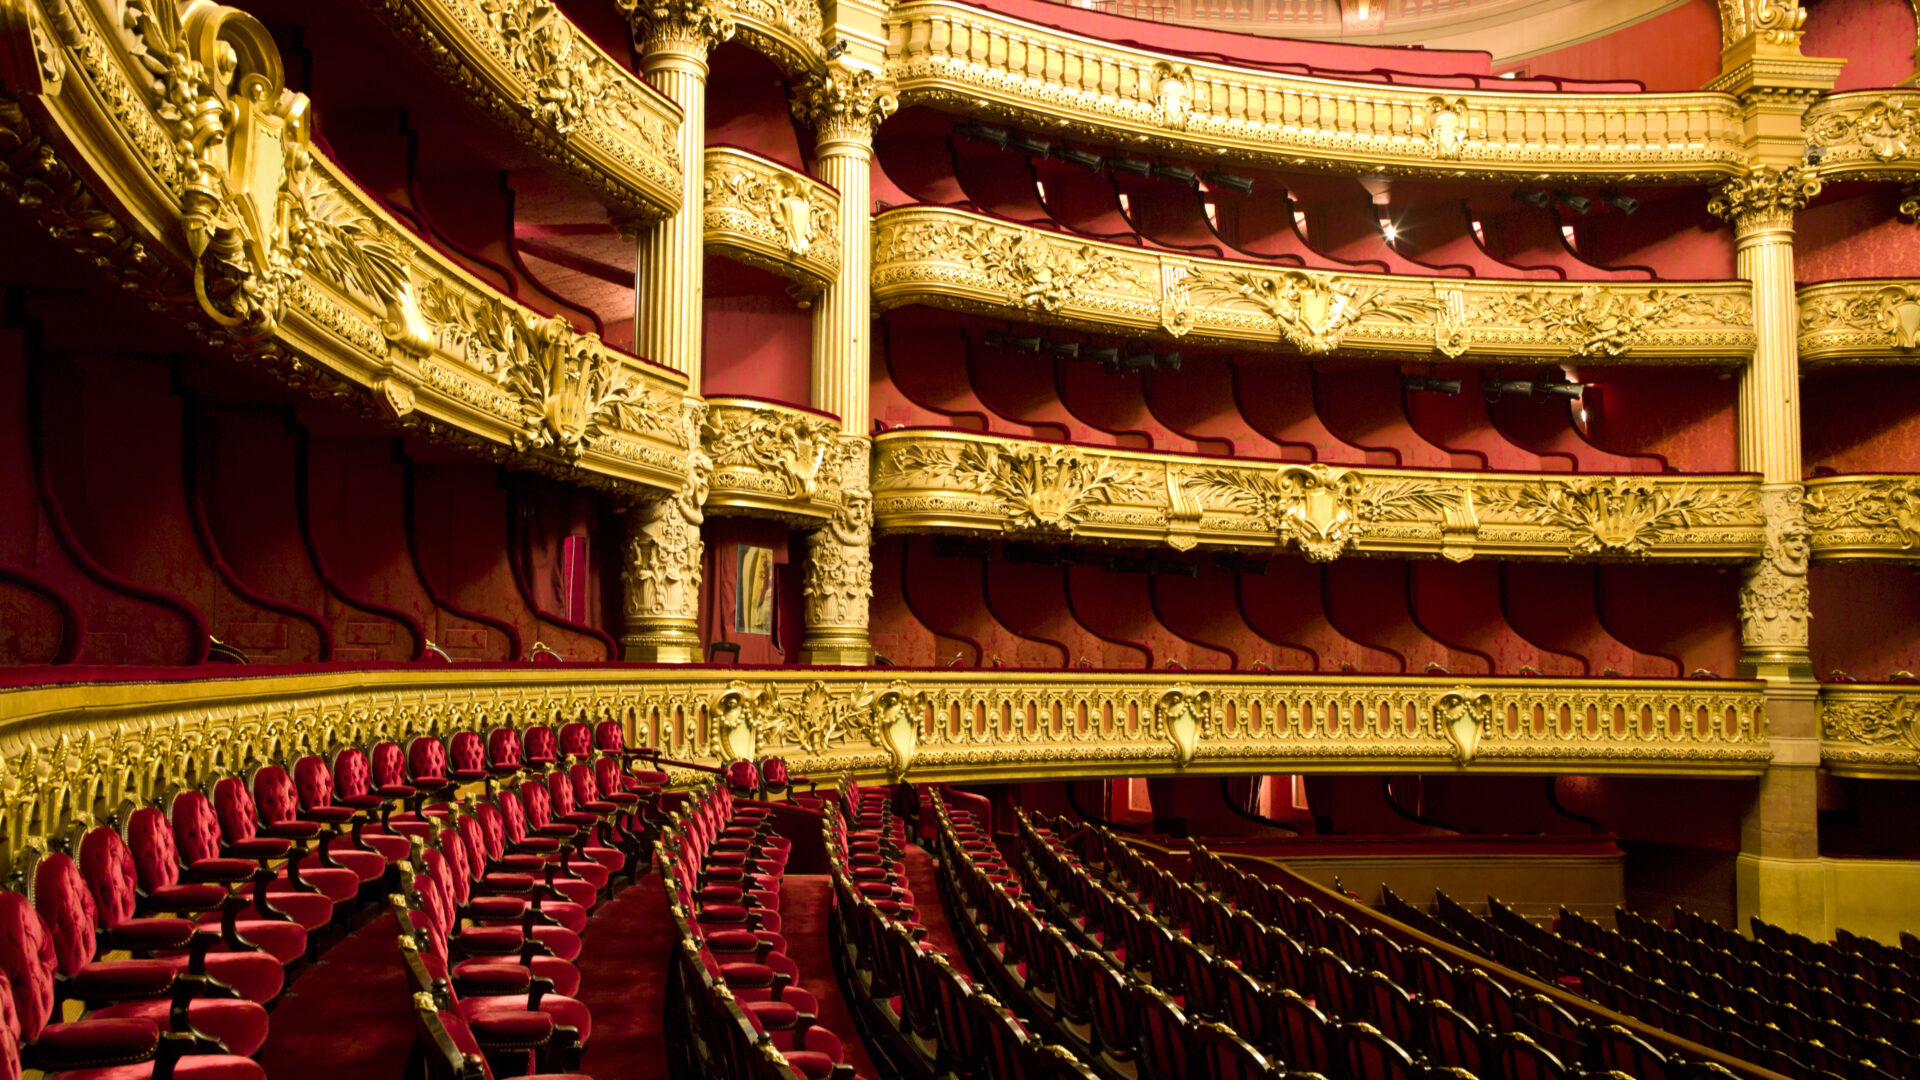 The inside of the Opera Garnier in Paris